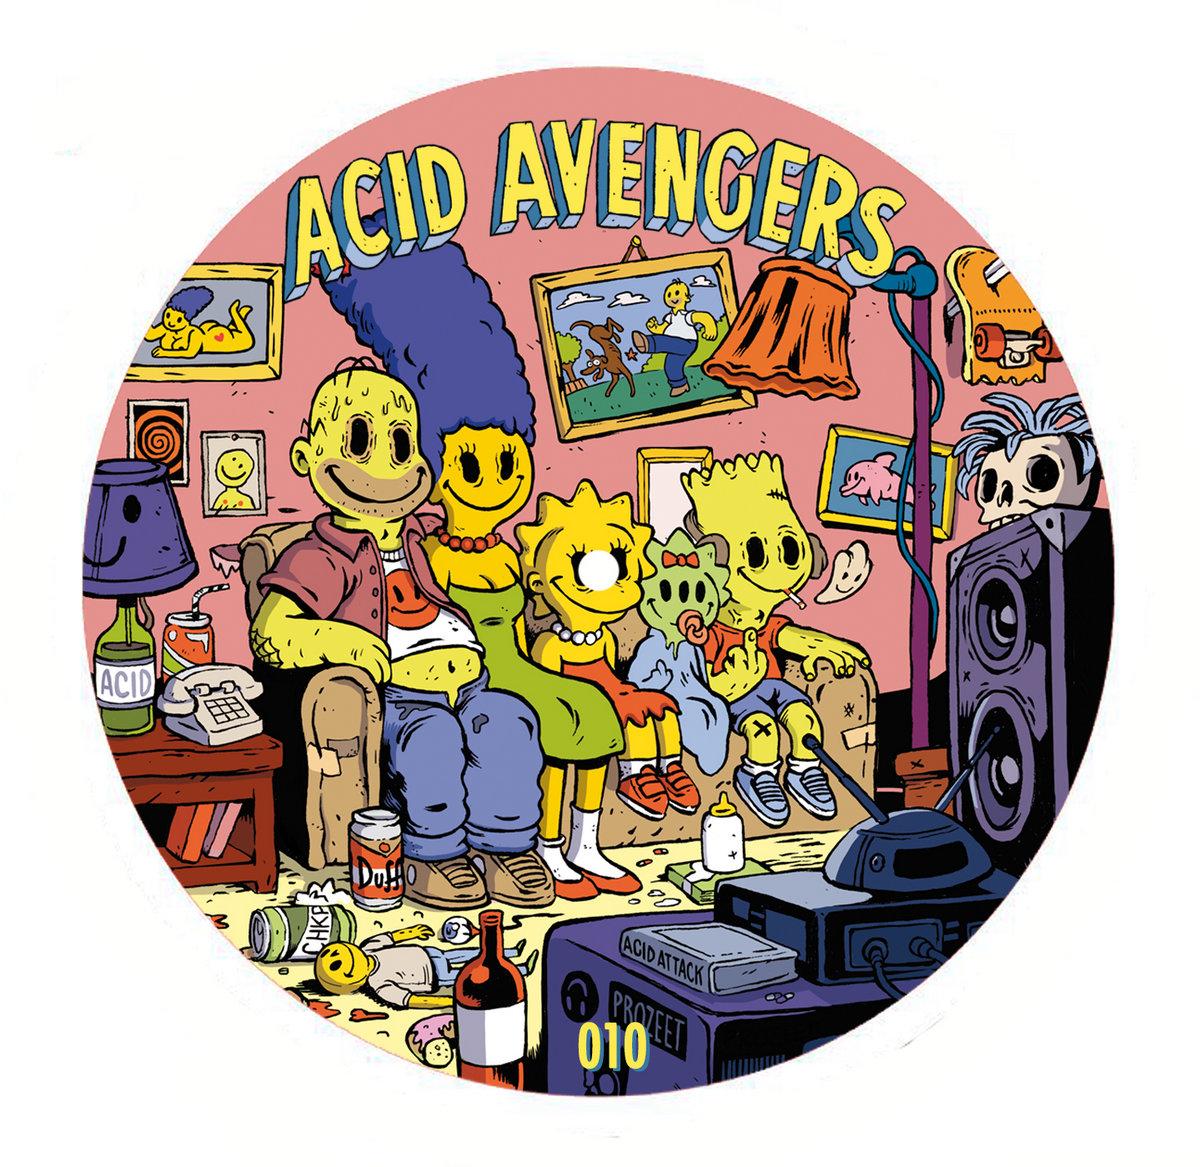 AAR010 - Acid Avengers 010 | T...